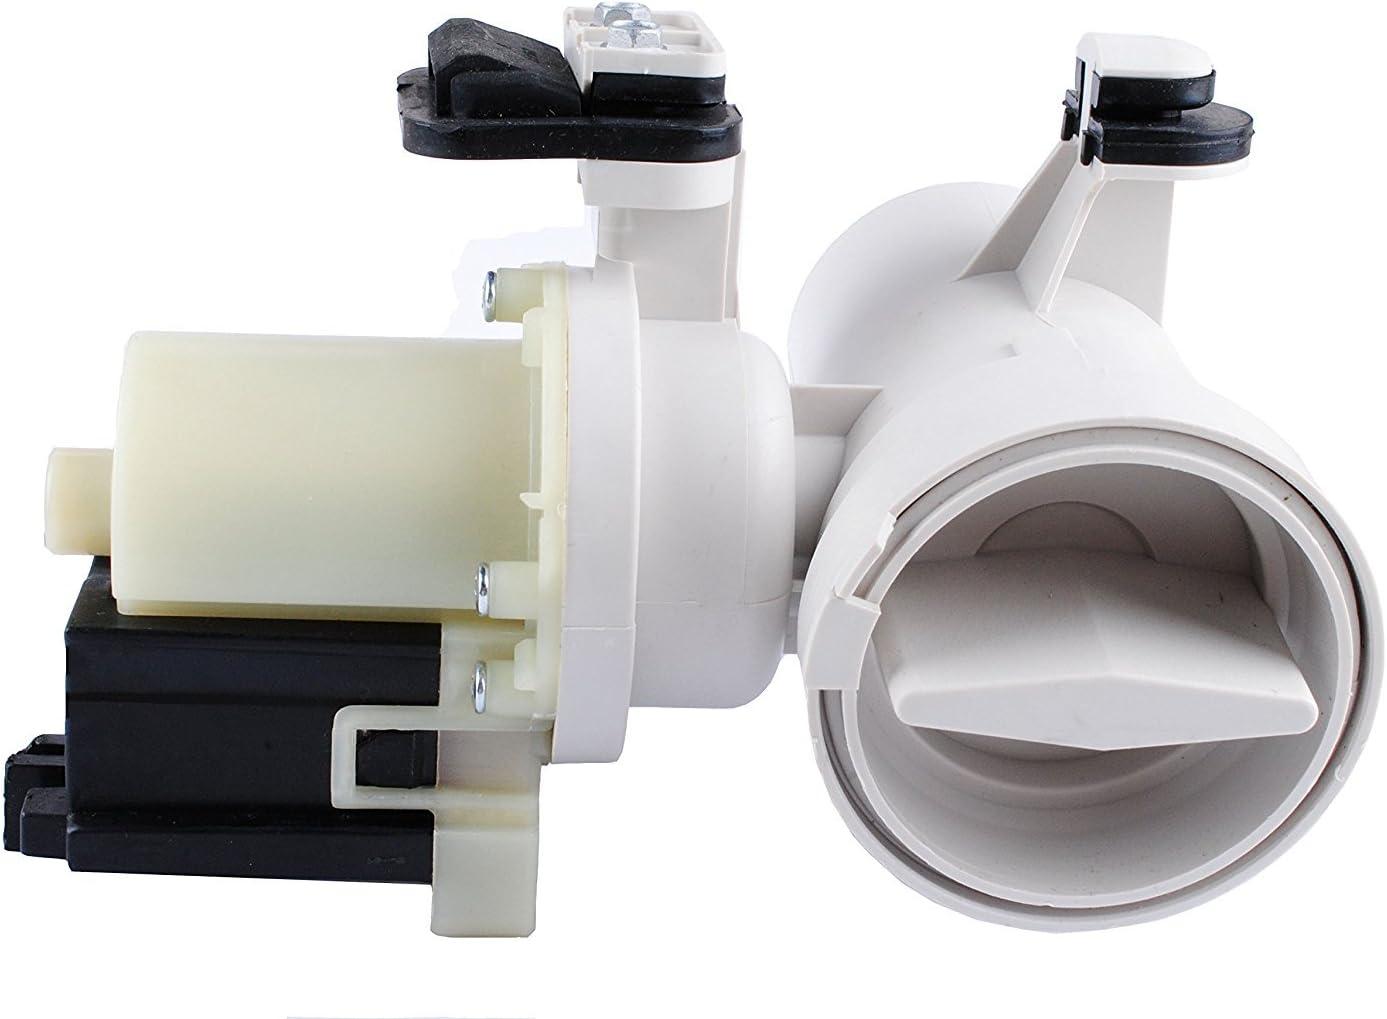 WHIRLPOOL OEM WHIRLPOOL 850024 Replacement Drain Pump W10130913 W10117829 Ap4308966 Ps1960402 ..